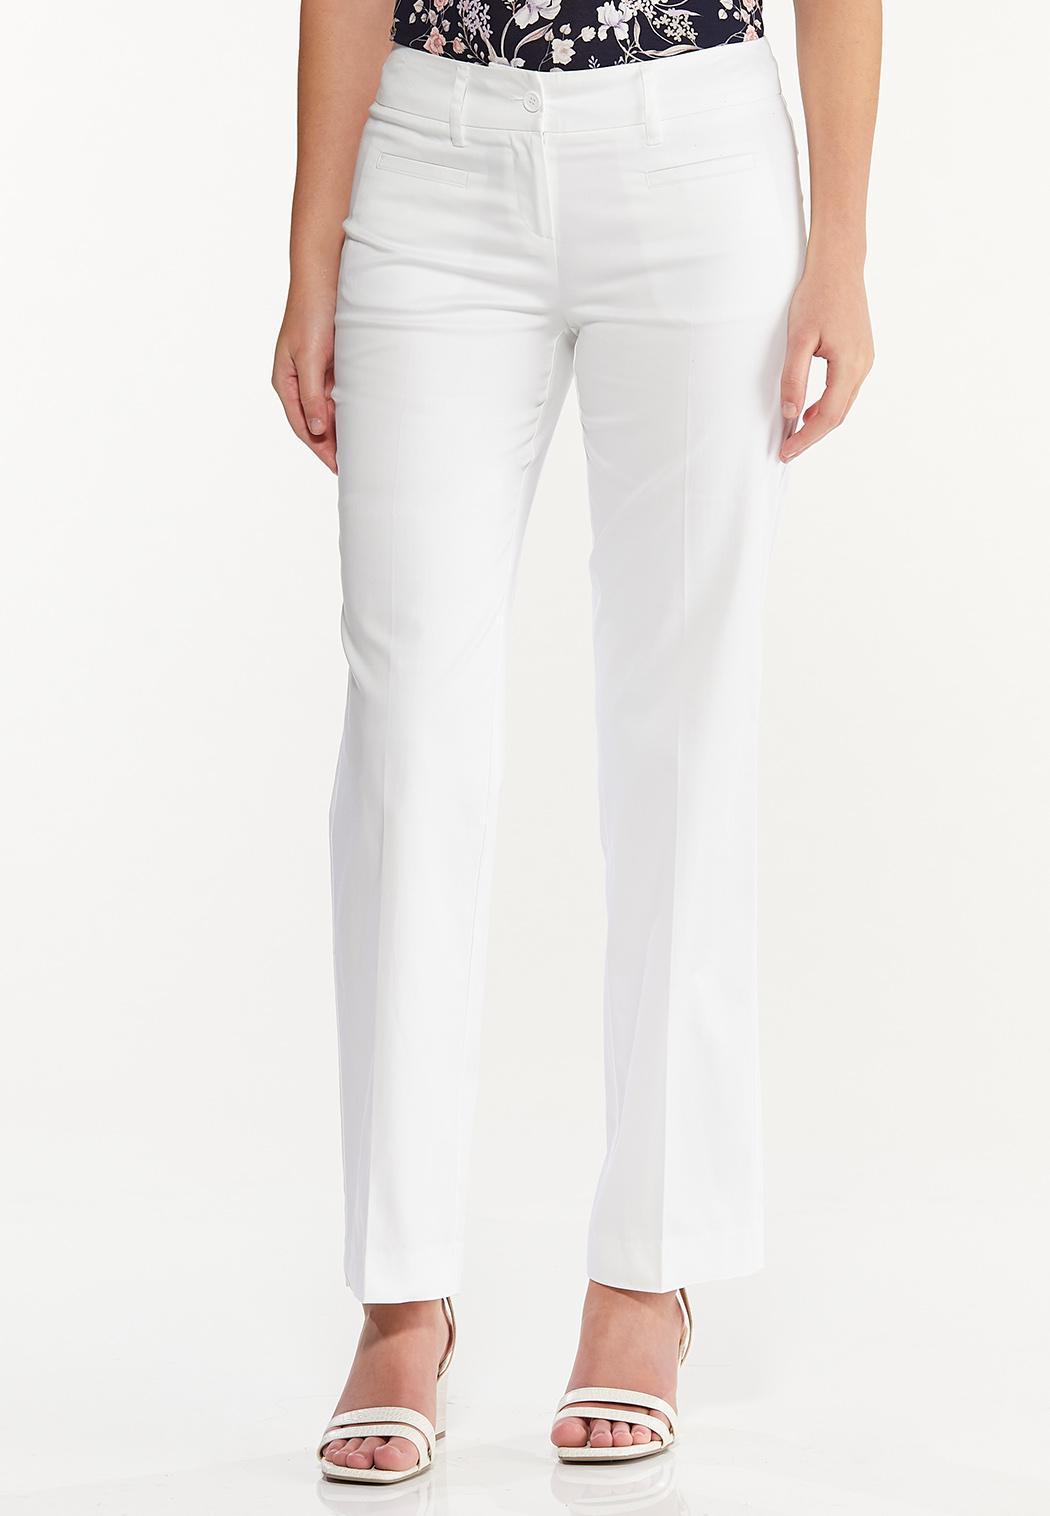 Sateen Trouser Pants (Item #44524310)